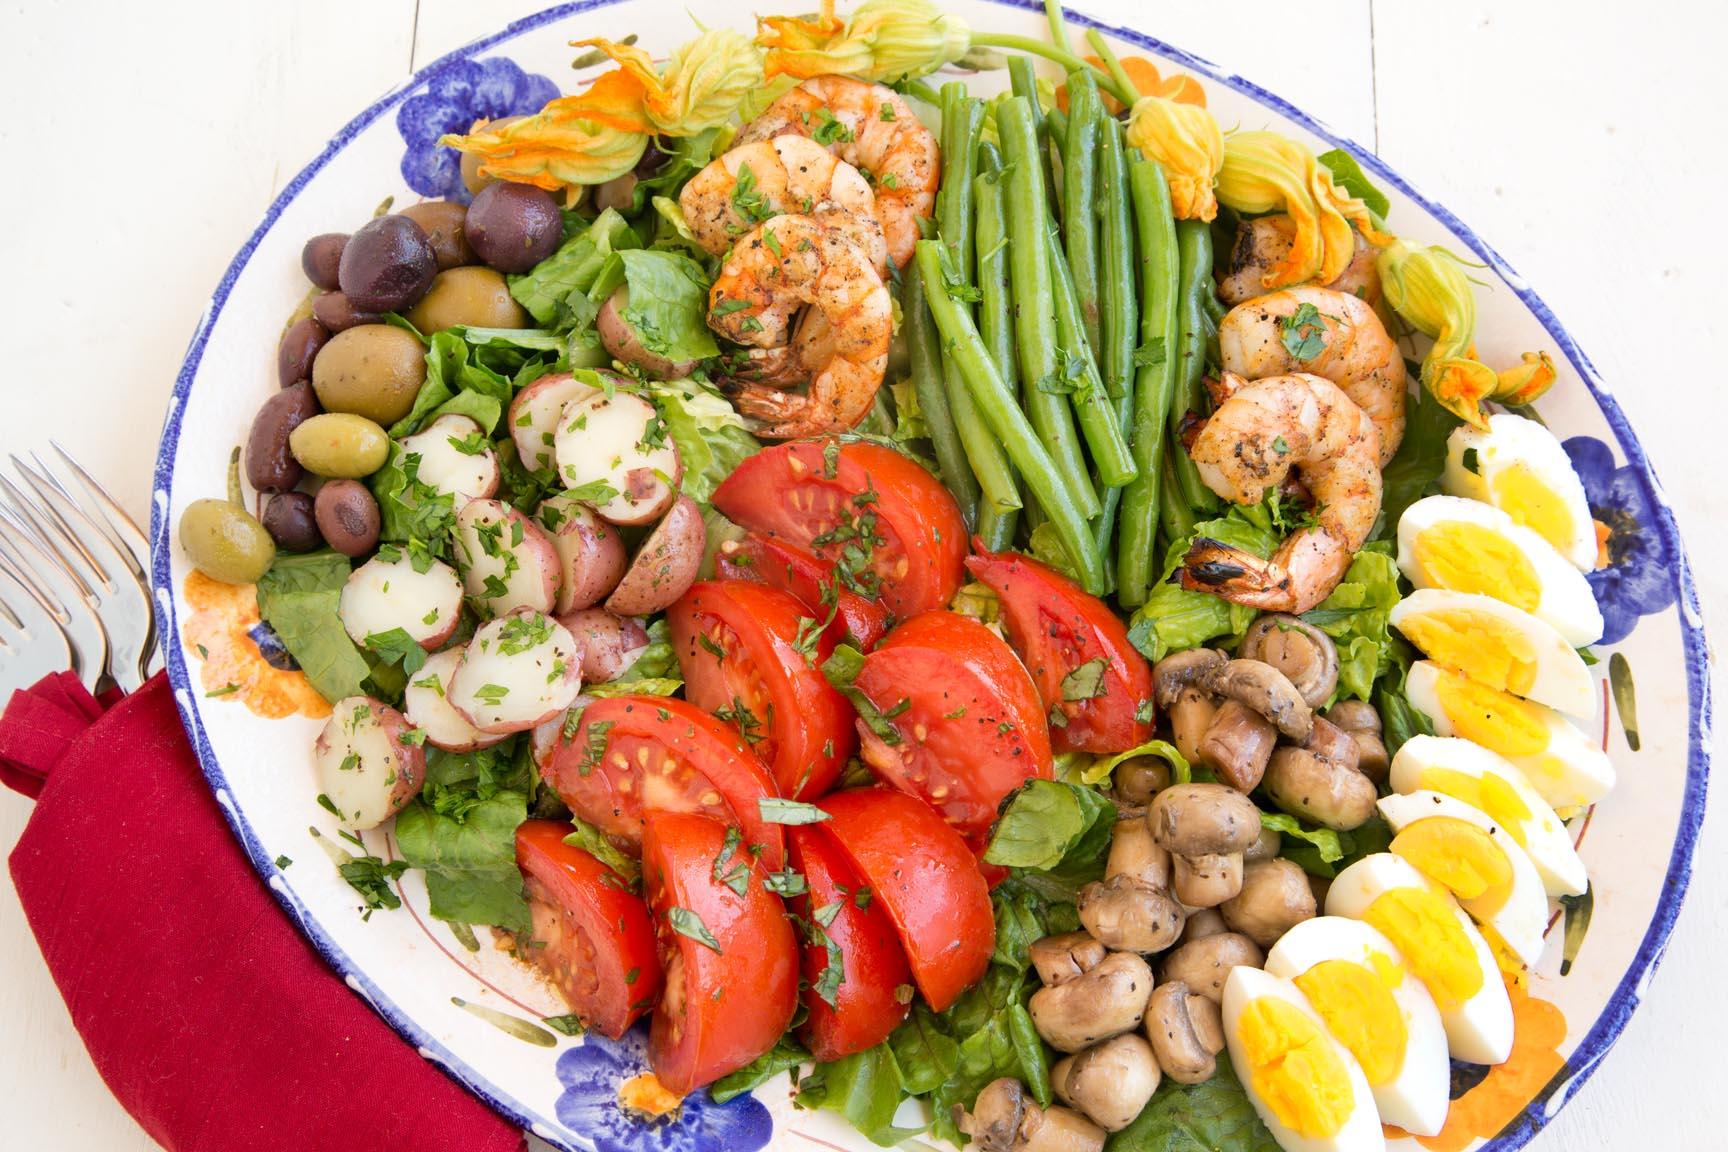 Nicoise Salad With Grilled Shrimp